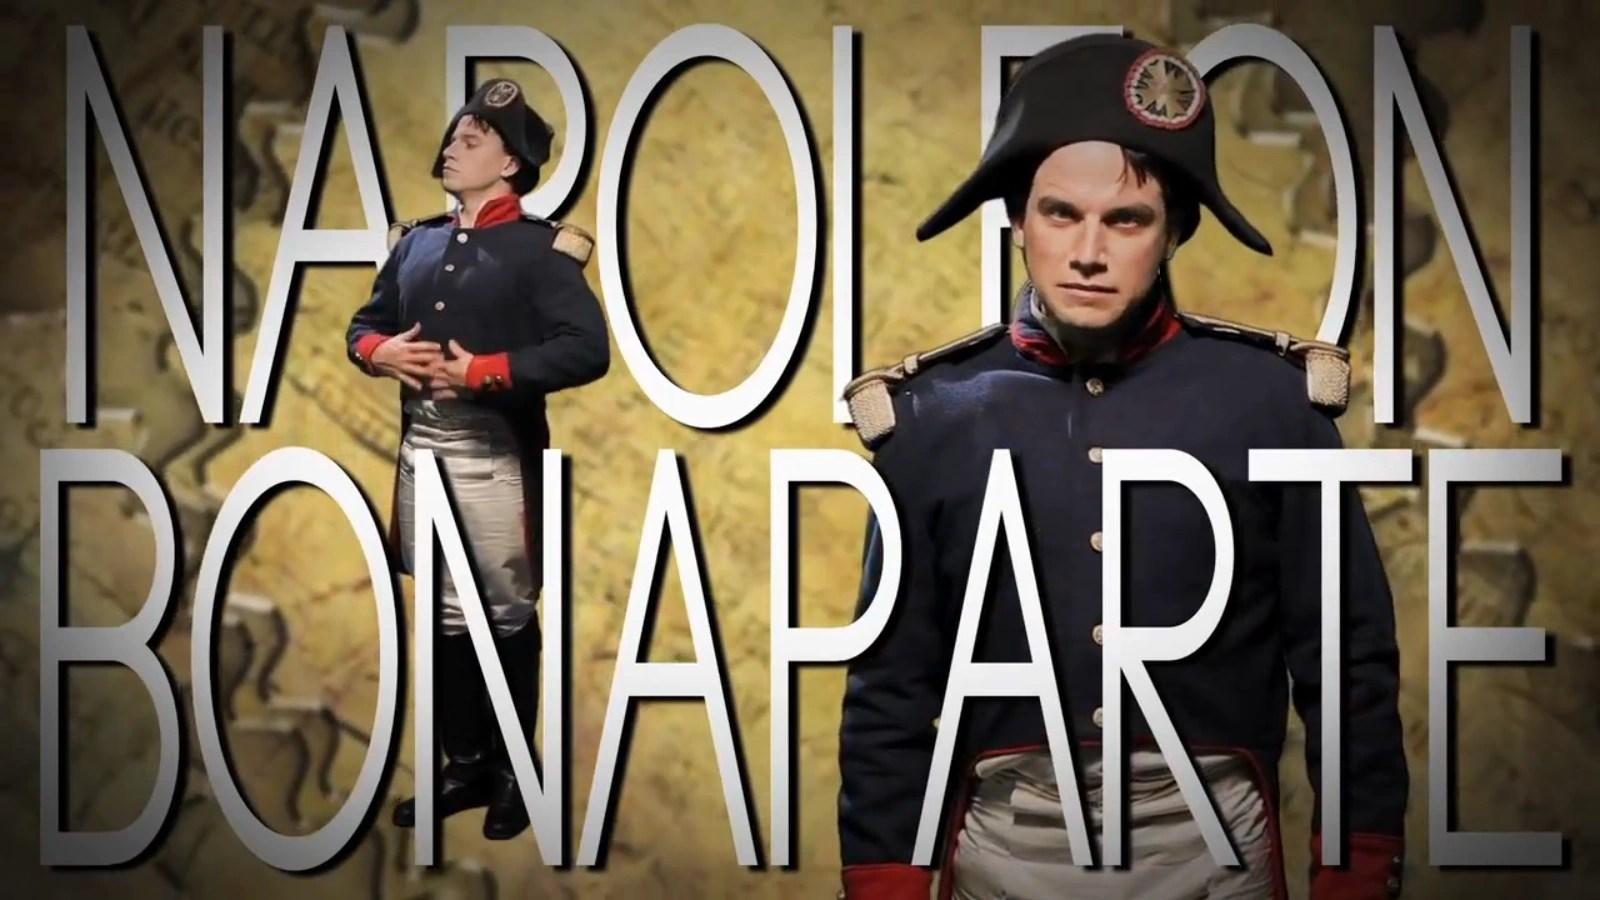 Dante On This Page Quotes Wallpaper Napoleon Bonaparte Epic Rap Battles Of History Wiki